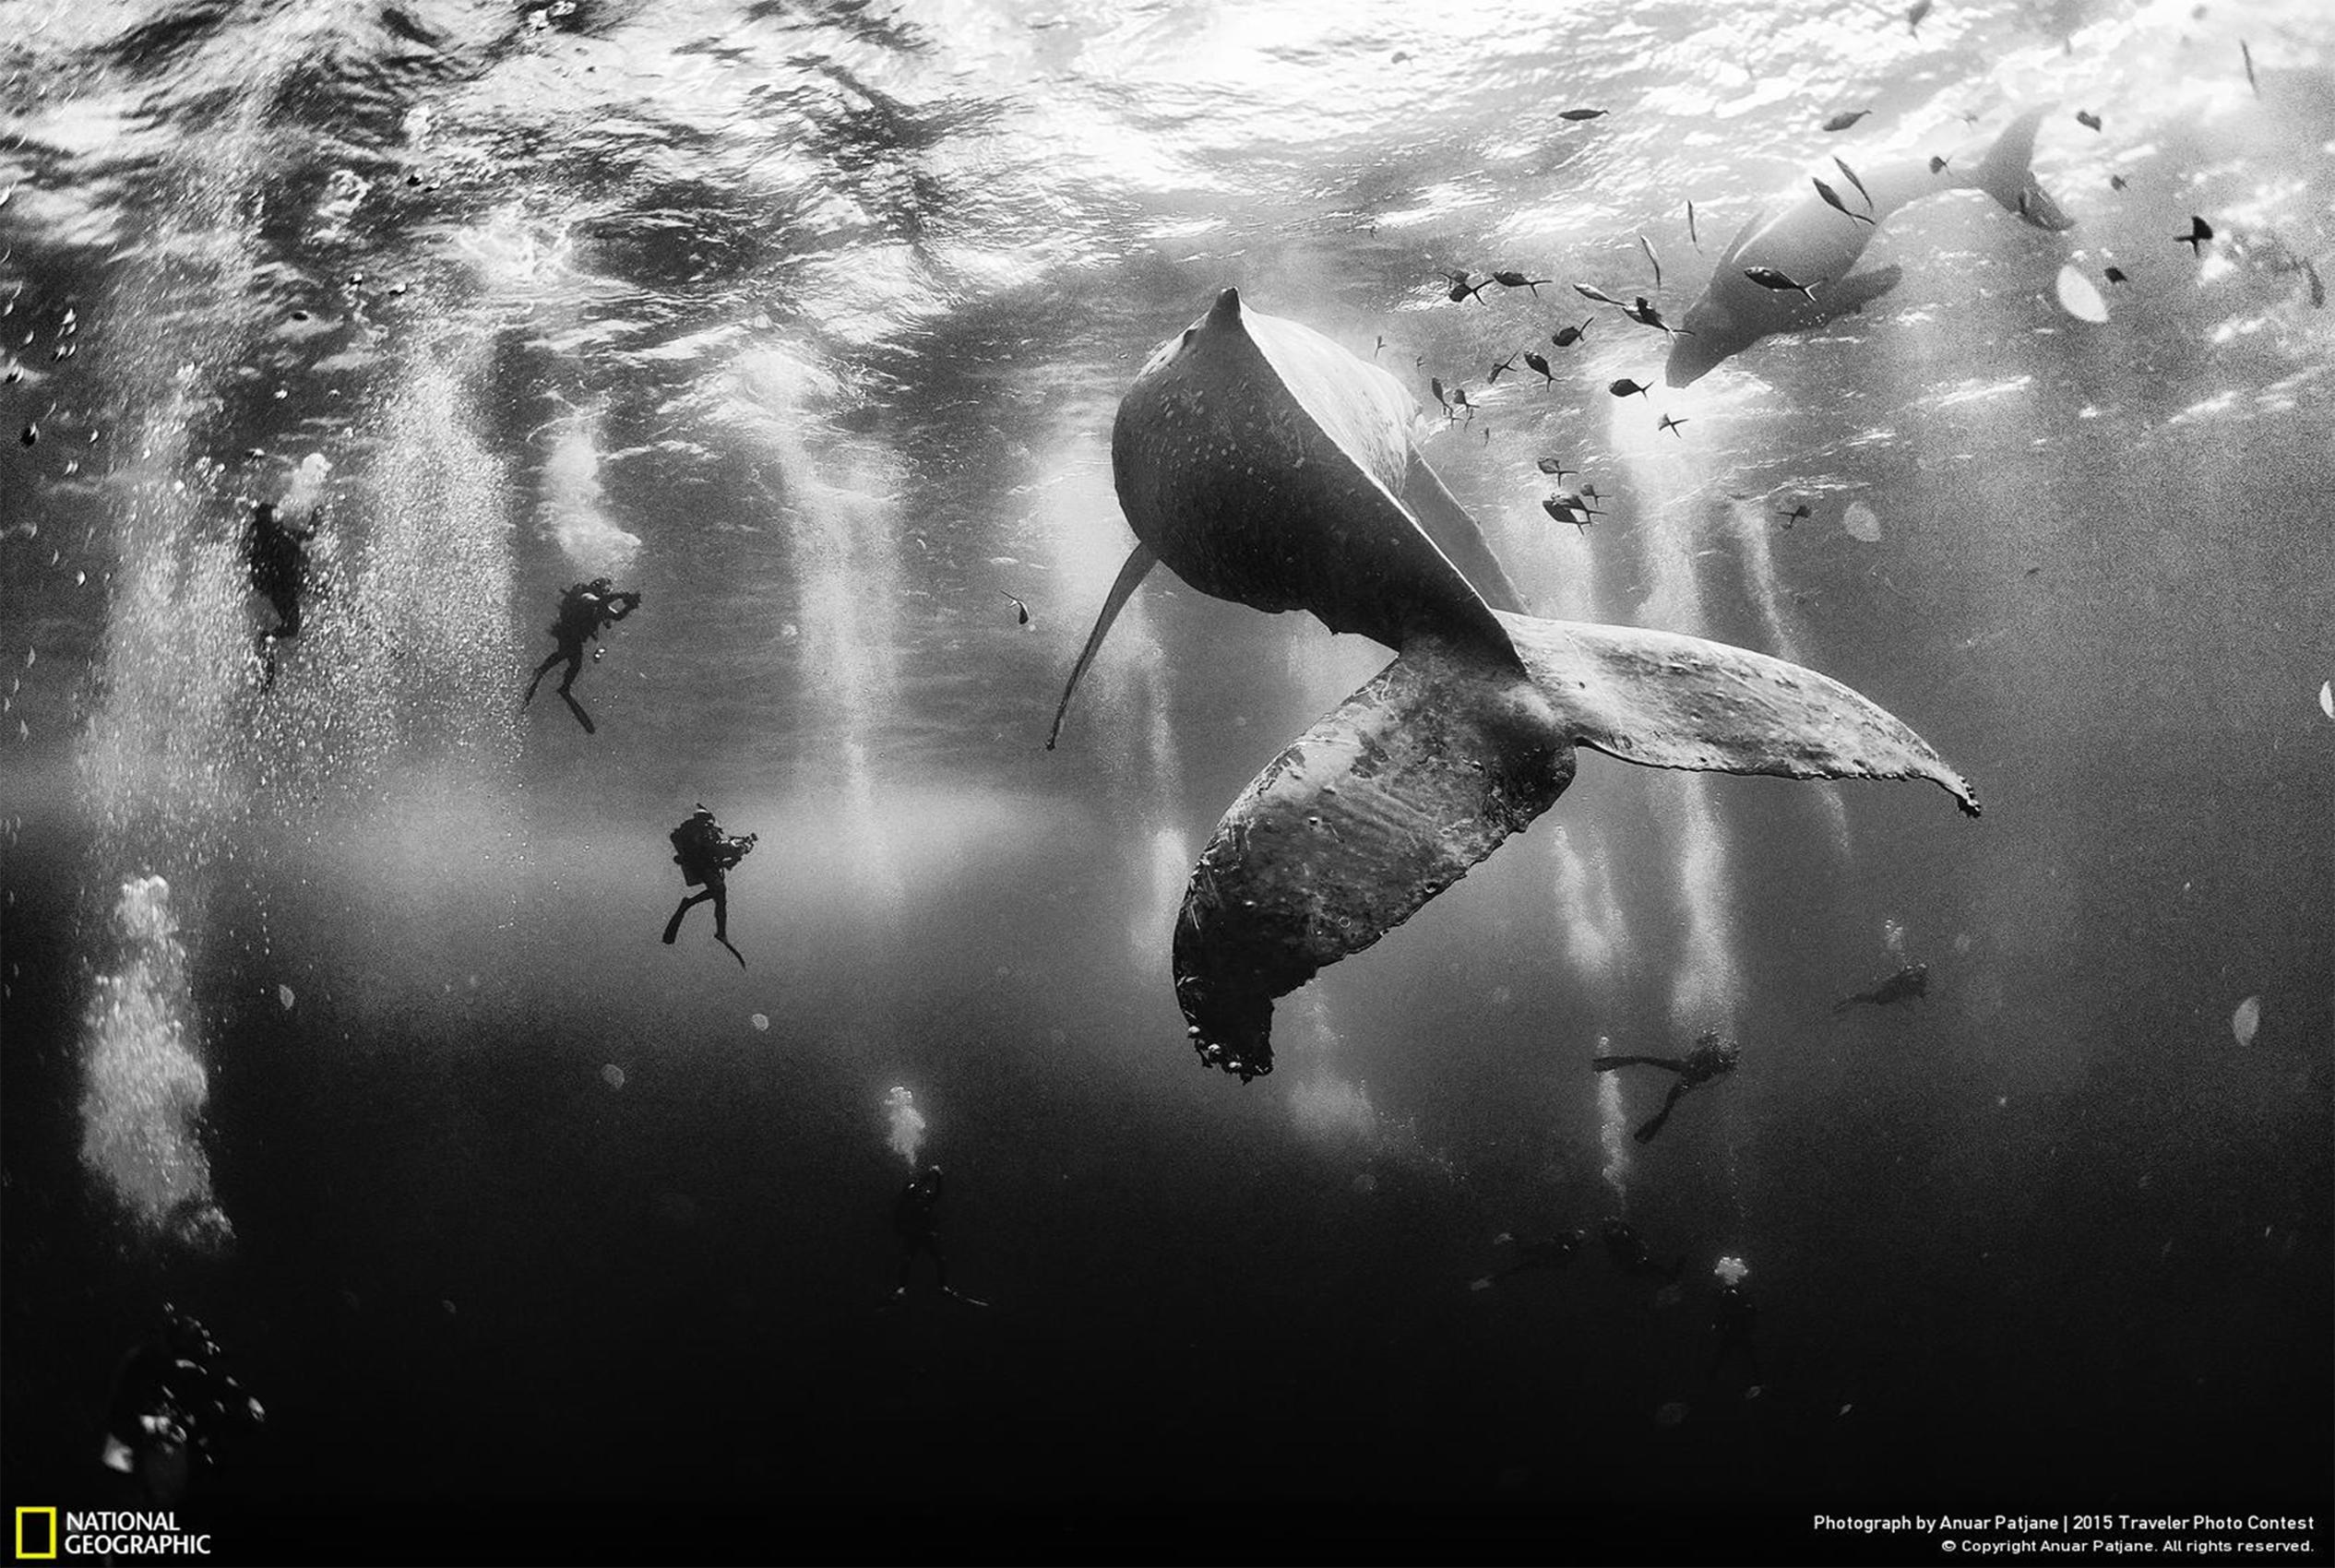 Mexicano ganó Concurso de fotos viajeros de National Geographic 2015